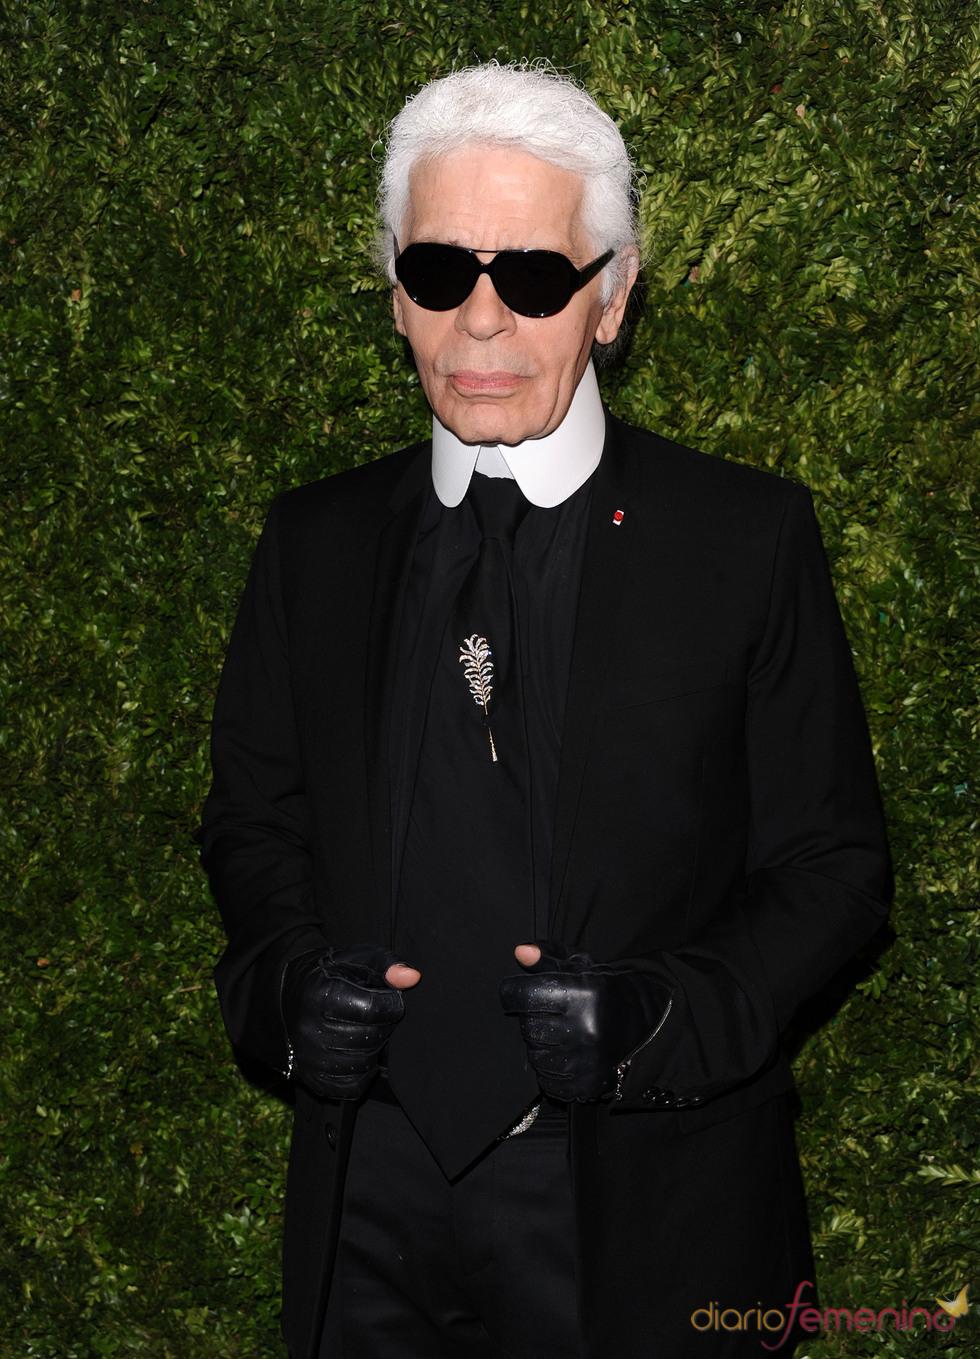 Karl Lagerfeld en los Premios Vogue Fashion Fund 2010